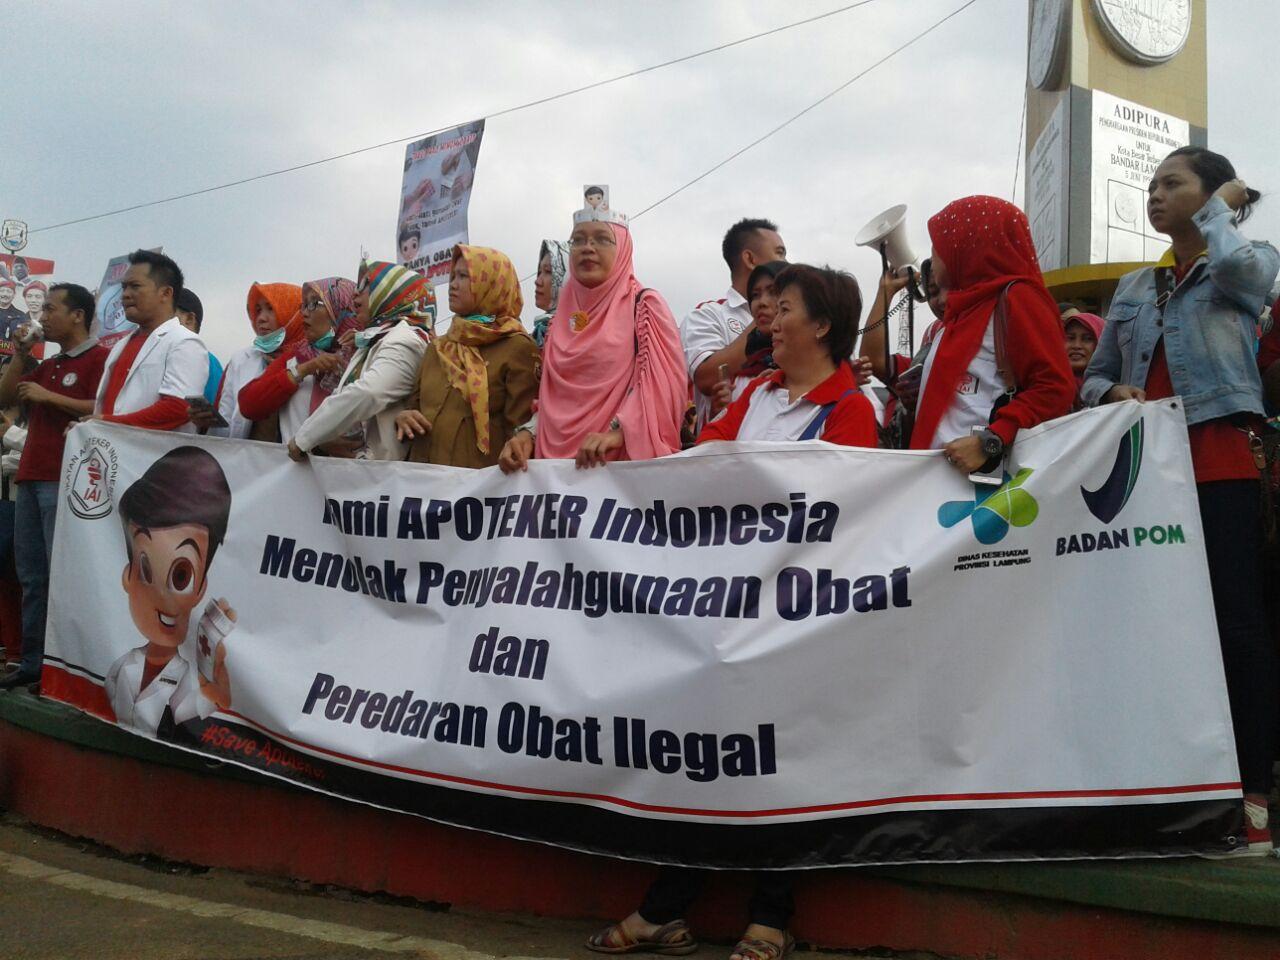 LAMPUNG POST | Gelar Aksi Simpatik, IAI Klaim Lampung Bebas Peredaran PCC